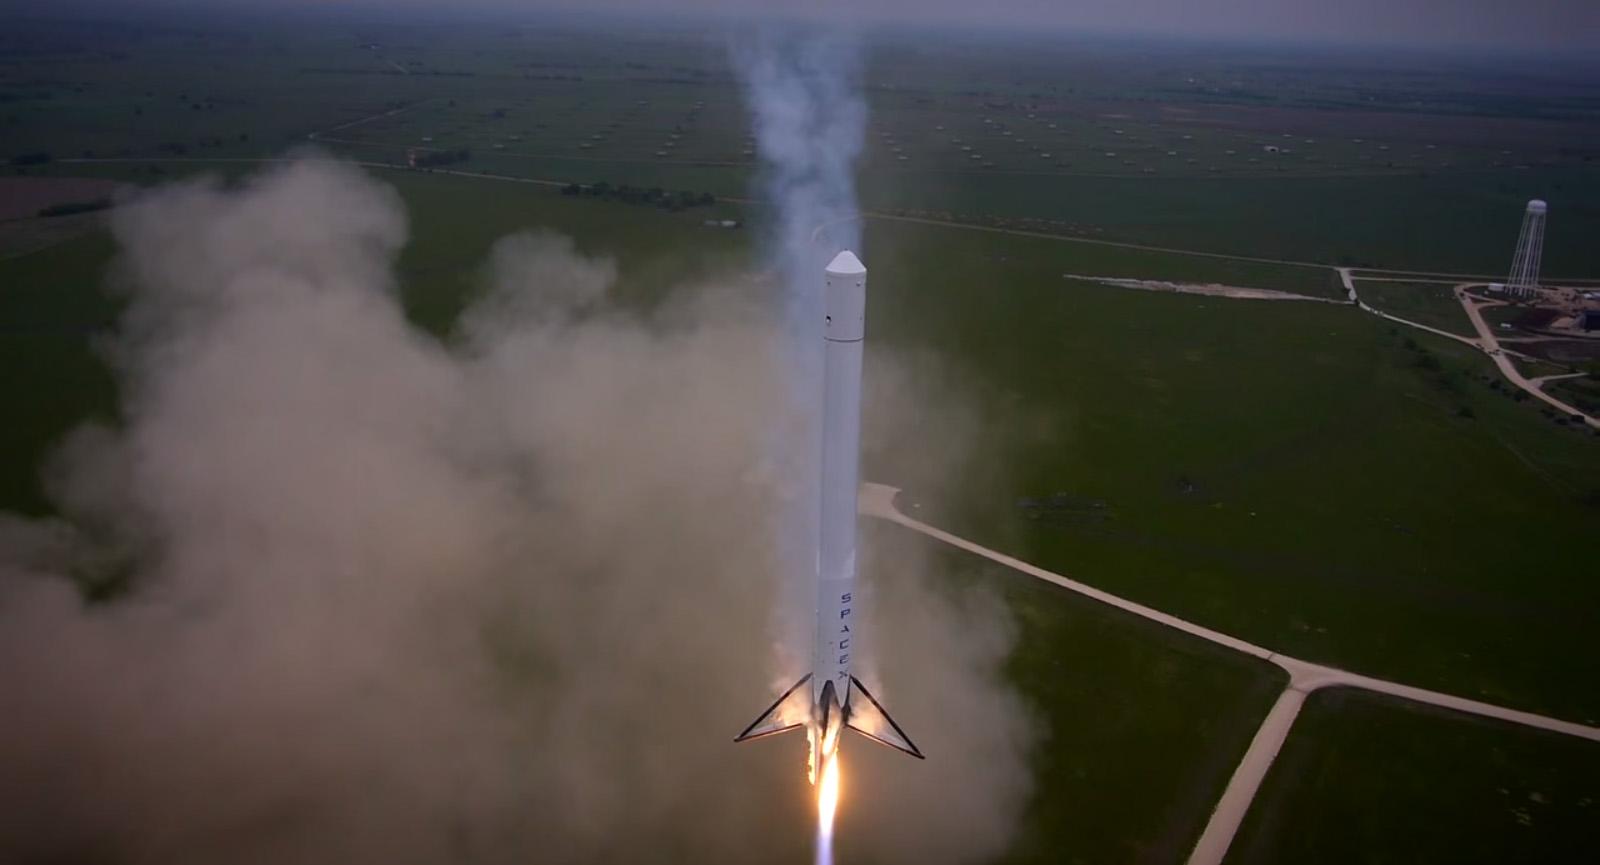 SpaceX Falcon 9 Reusable Rocket Descent